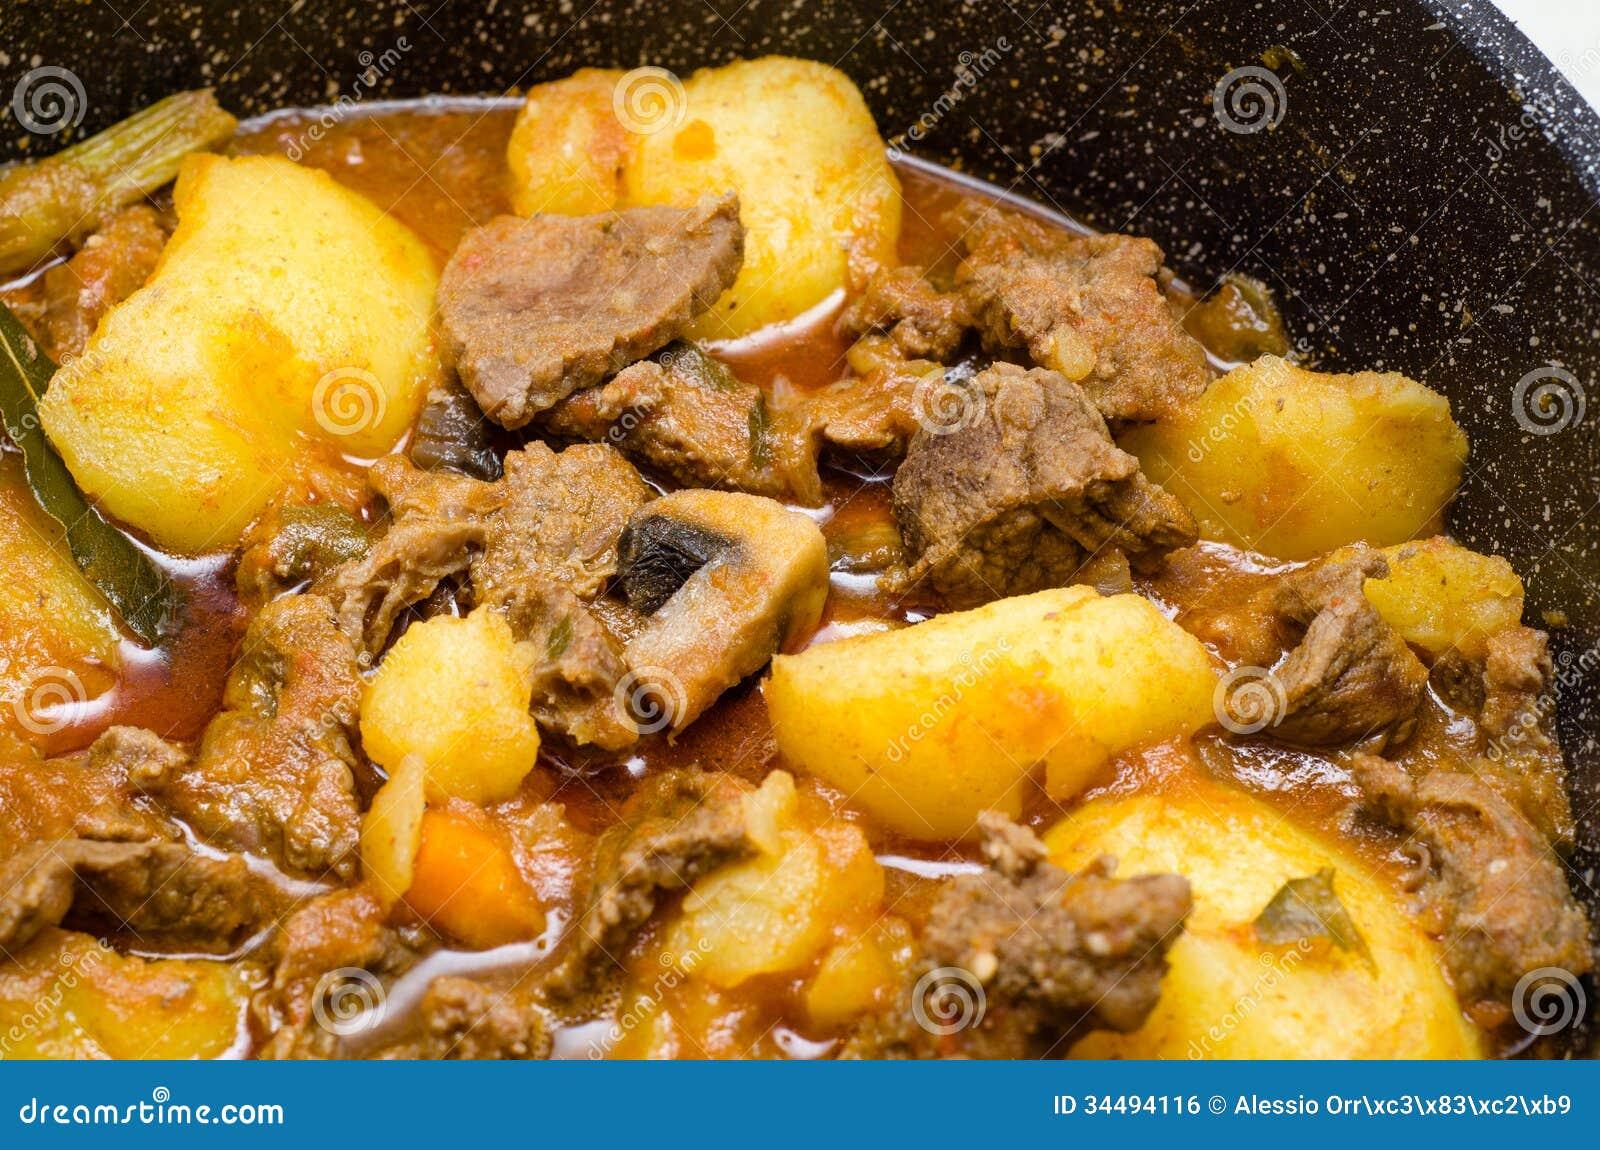 Meat, Potato And Mushroom Stew Royalty Free Stock Image - Image ...